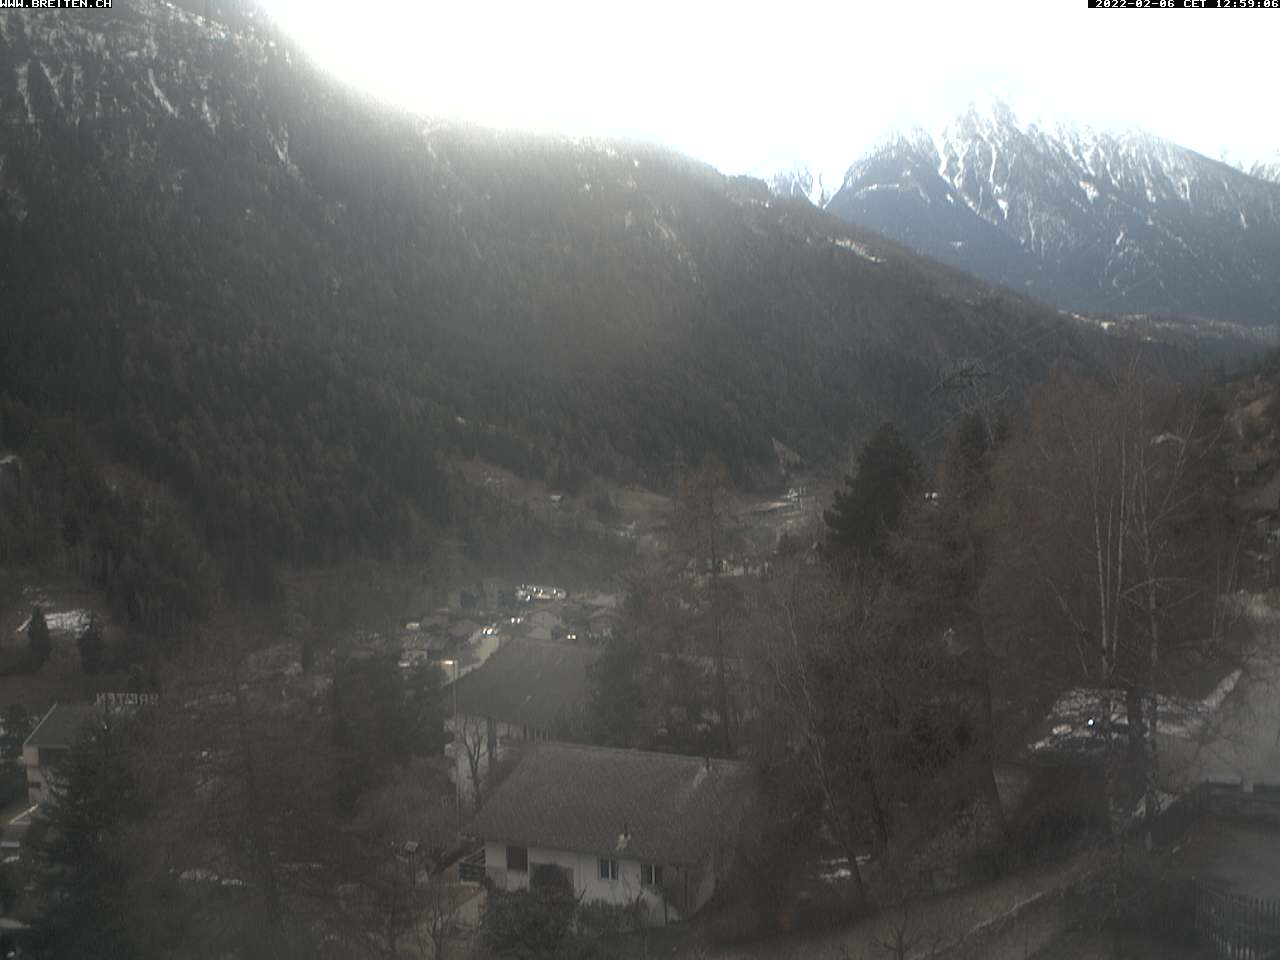 Badekkurort Breiten ob Mörel-Filet Wallis Schweiz